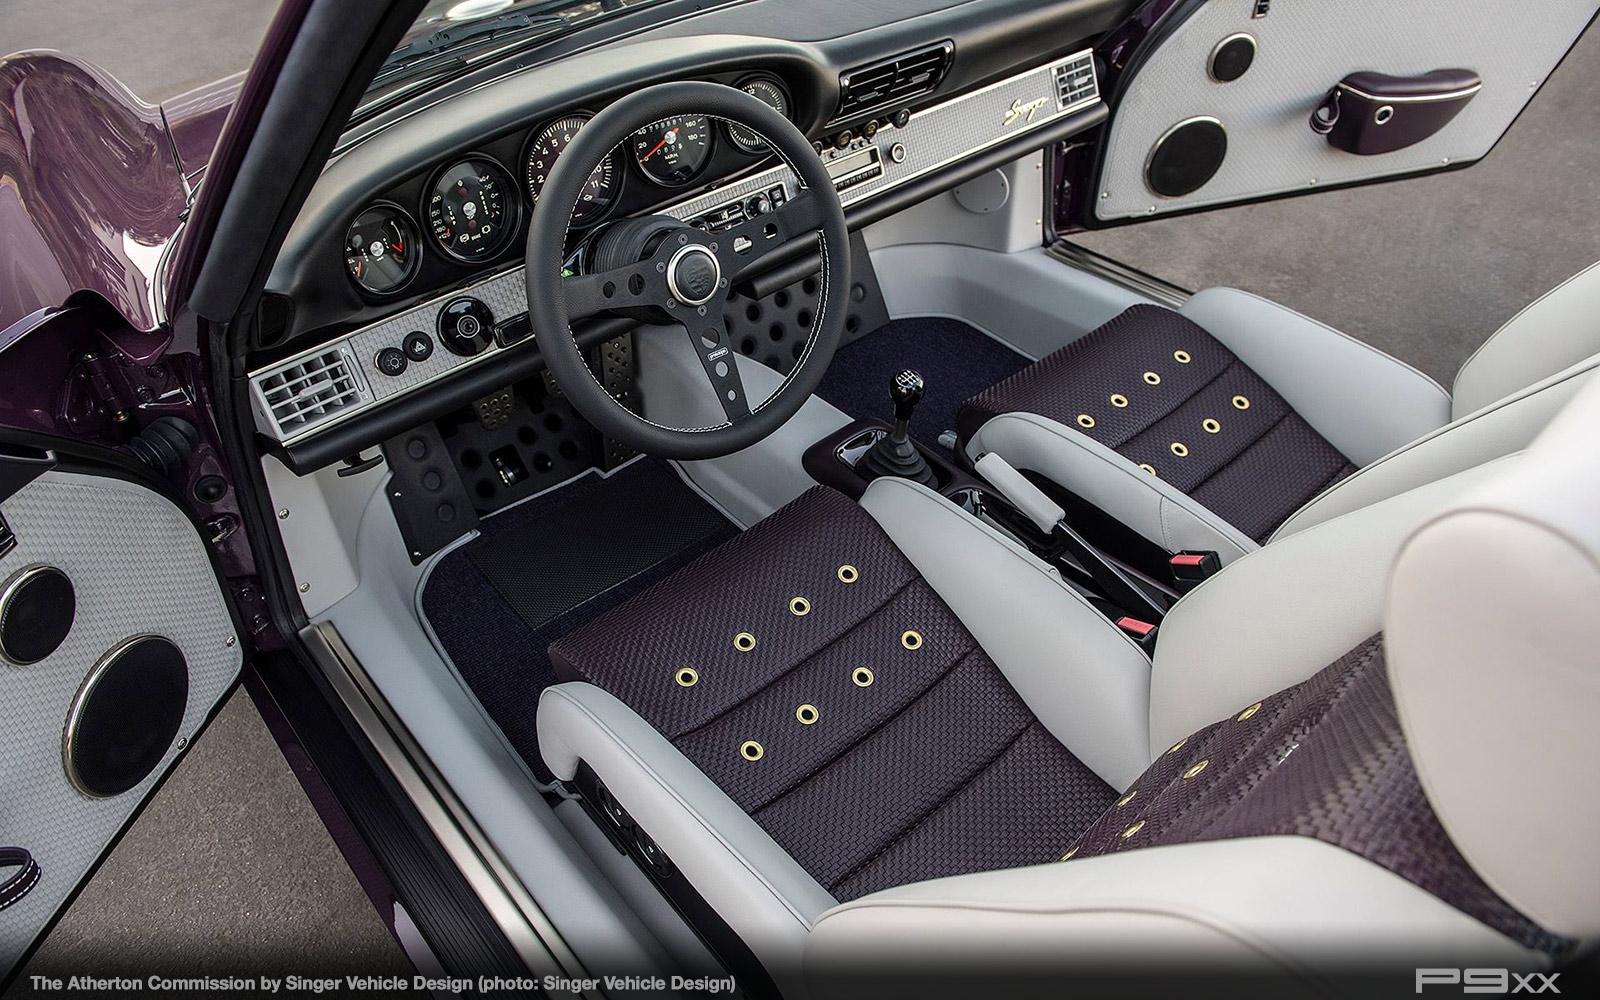 Singer Atherton Is One Incredibly Purple Porsche Targa P9xx